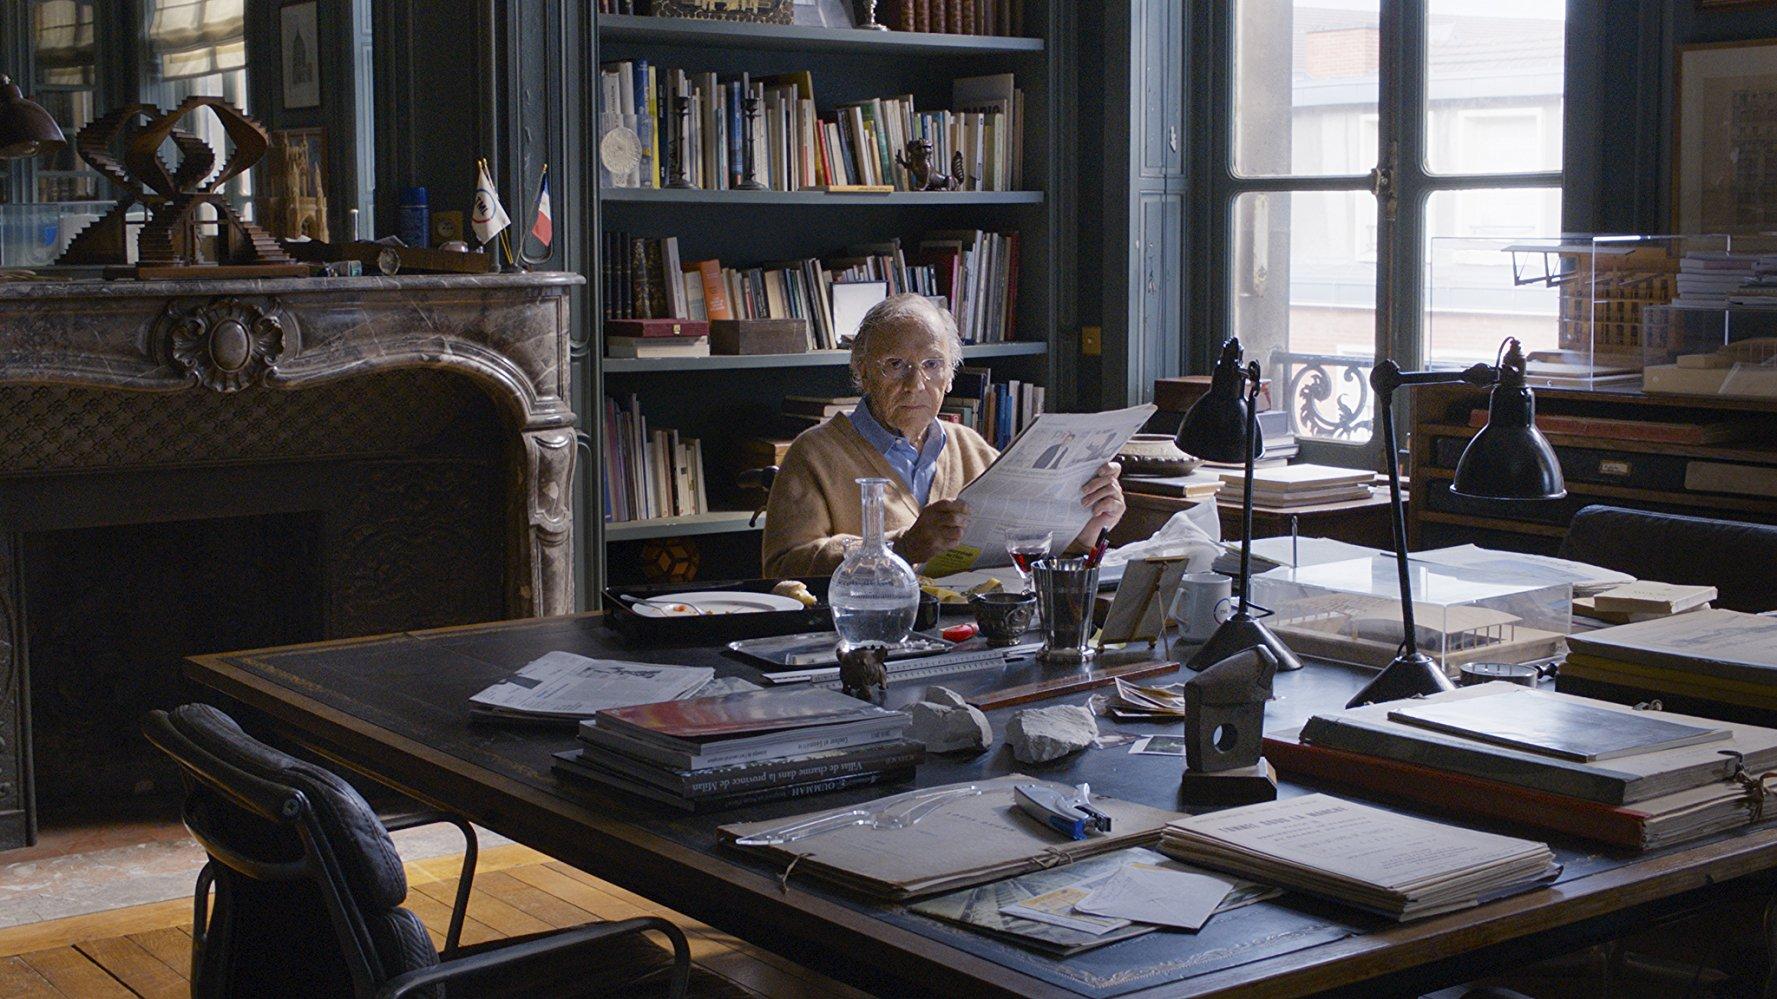 Jean-Louis Trintignant in <i>Happy End</i>